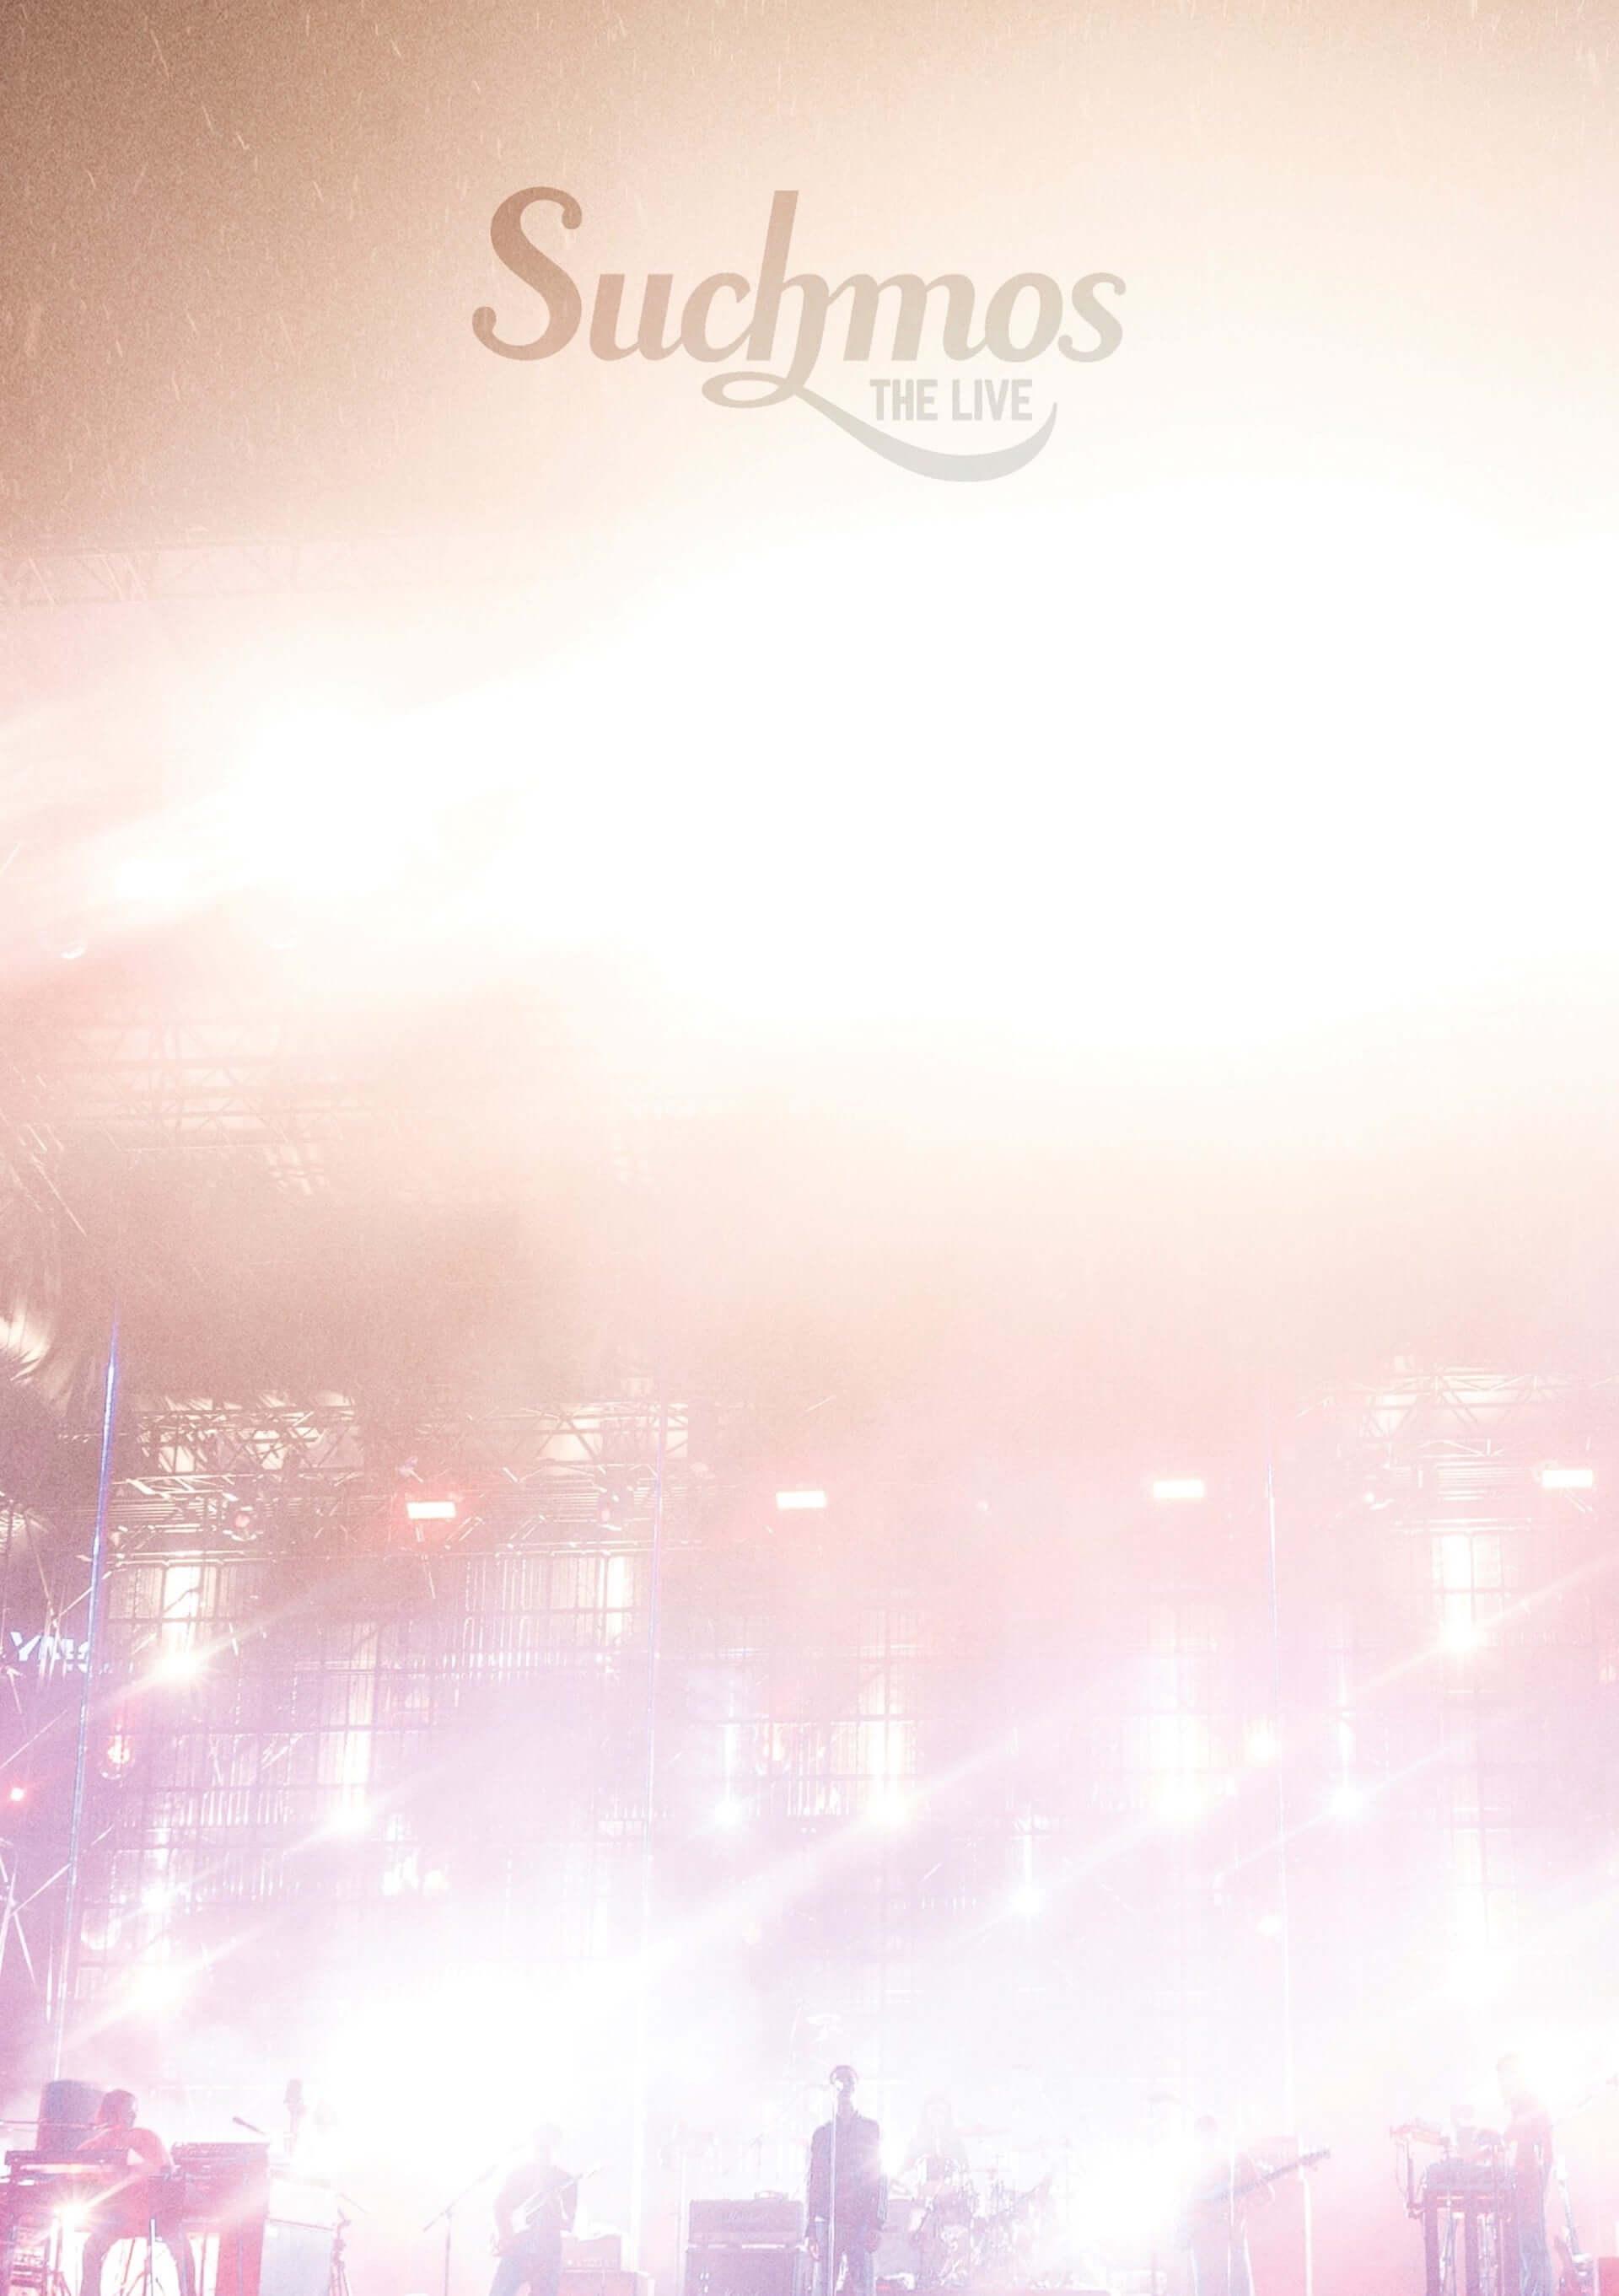 Suchmosの特設サイト内に「Suchmos room」が突如オープン|未公開ライブ映像含む貴重コンテンツが多数公開 music200610_suchmos_6-1920x2723